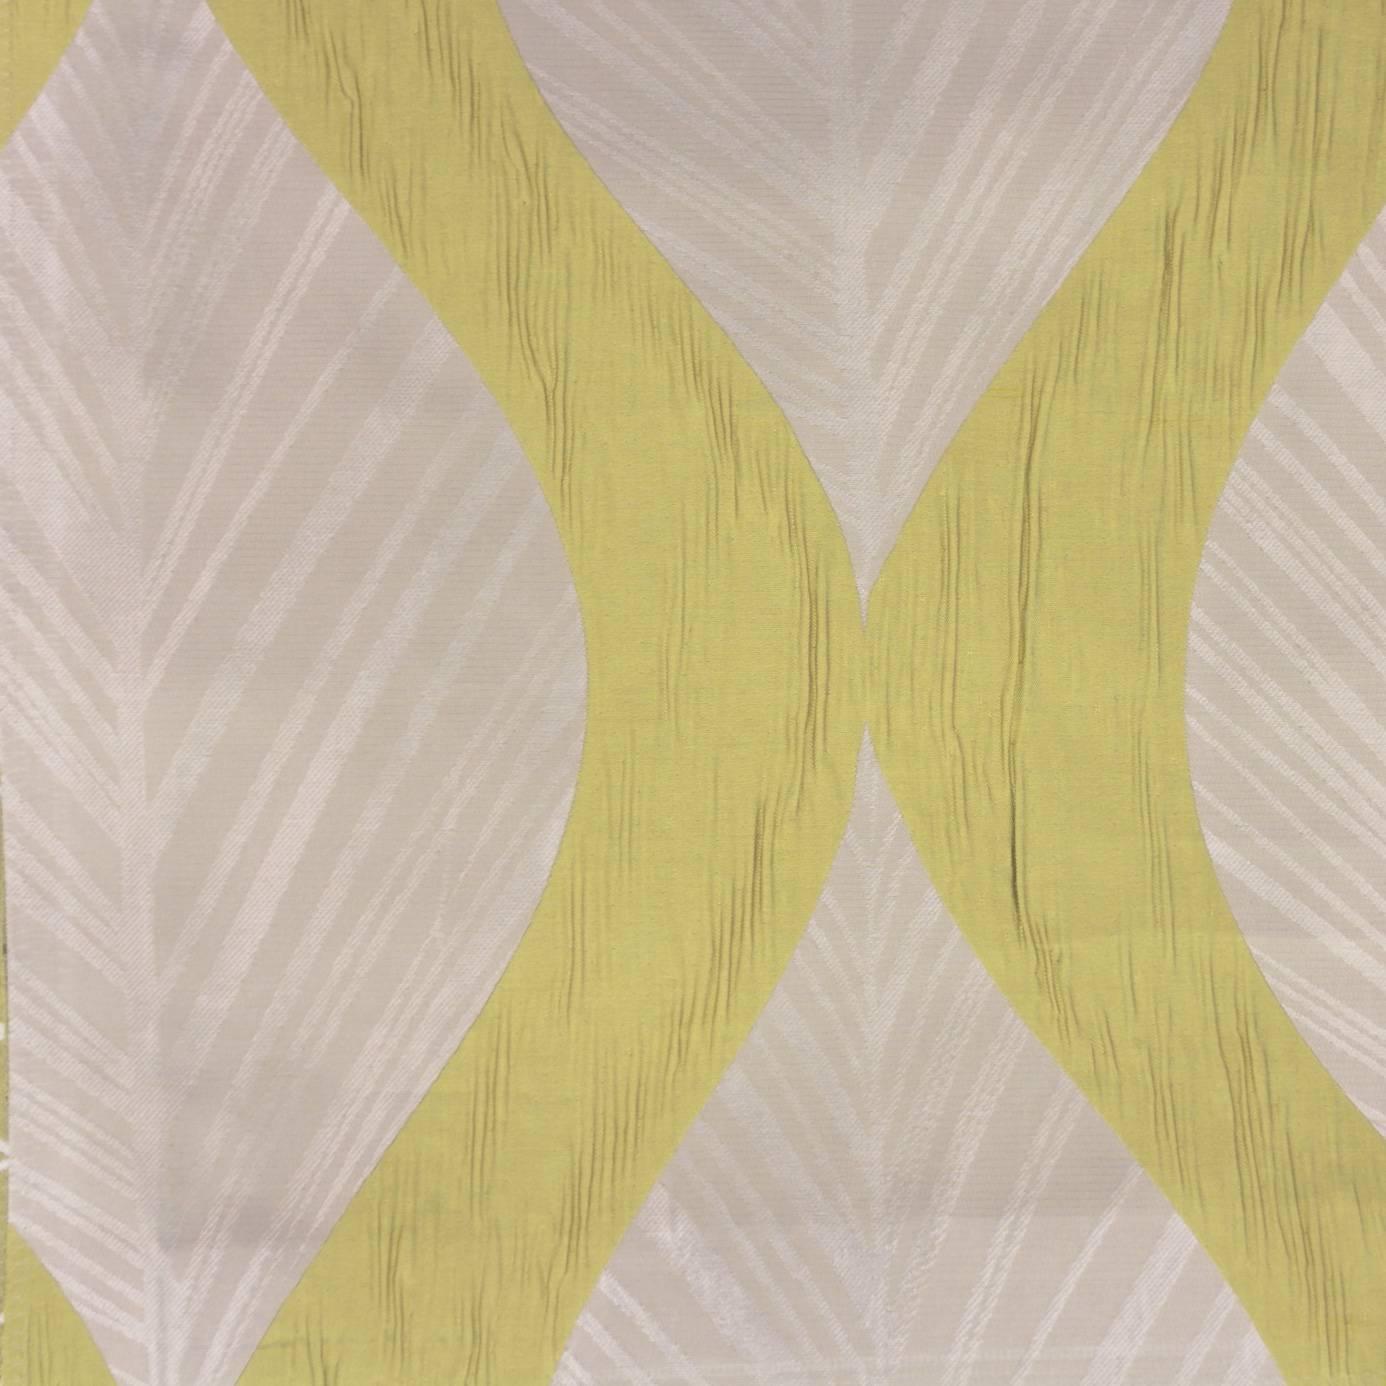 Botinia Fabric  Wasabi (BOTINIAWASABI)  Ashley Wilde Botinia Fabrics Collec # Wasbak Fabriek_155207